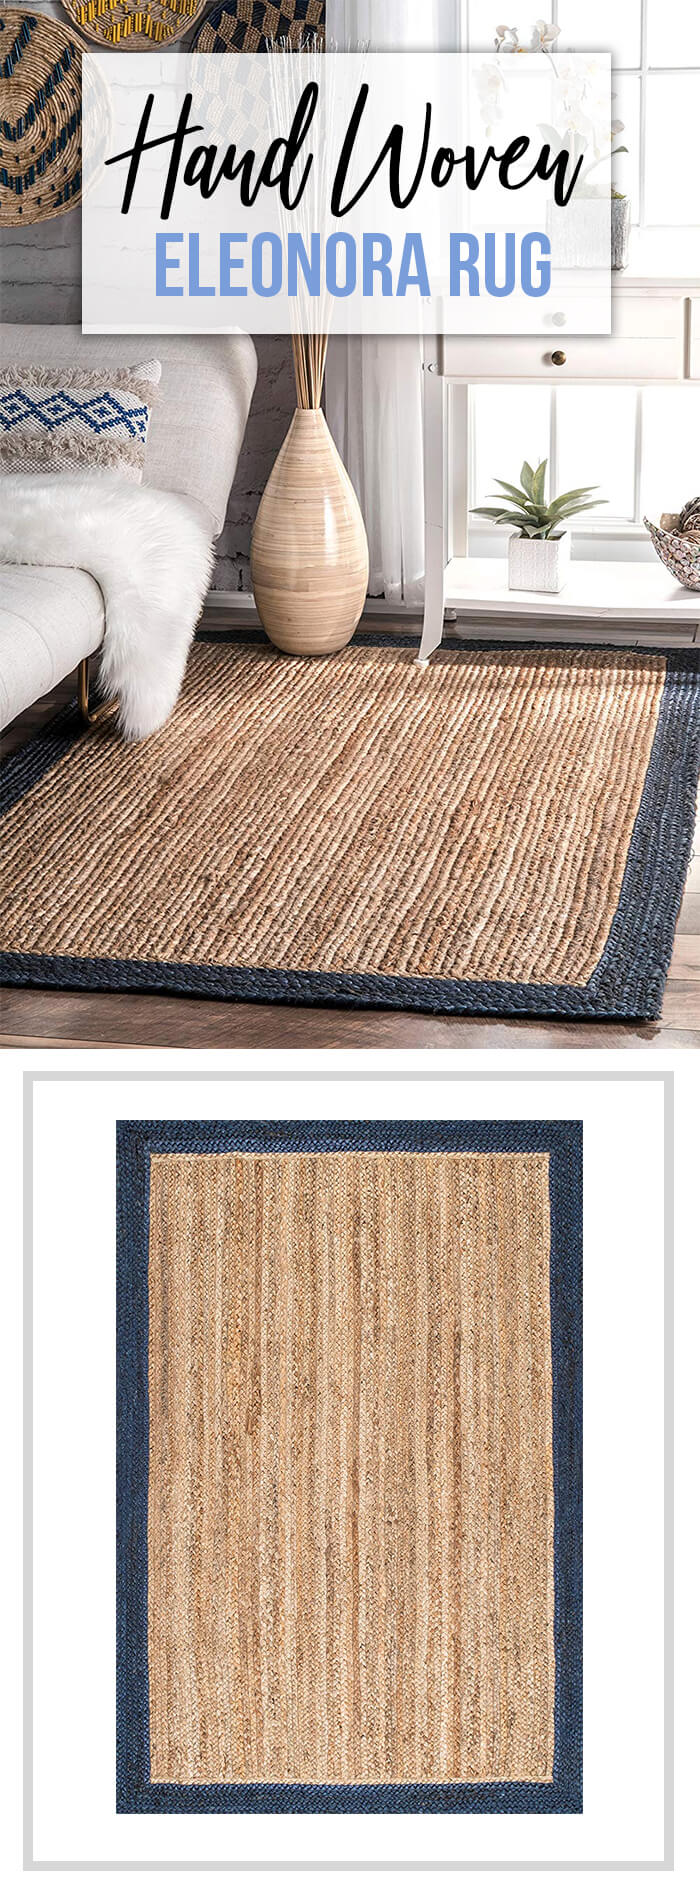 Comfortable, Functional & Eco-Friendly Woven Eleanora Rug